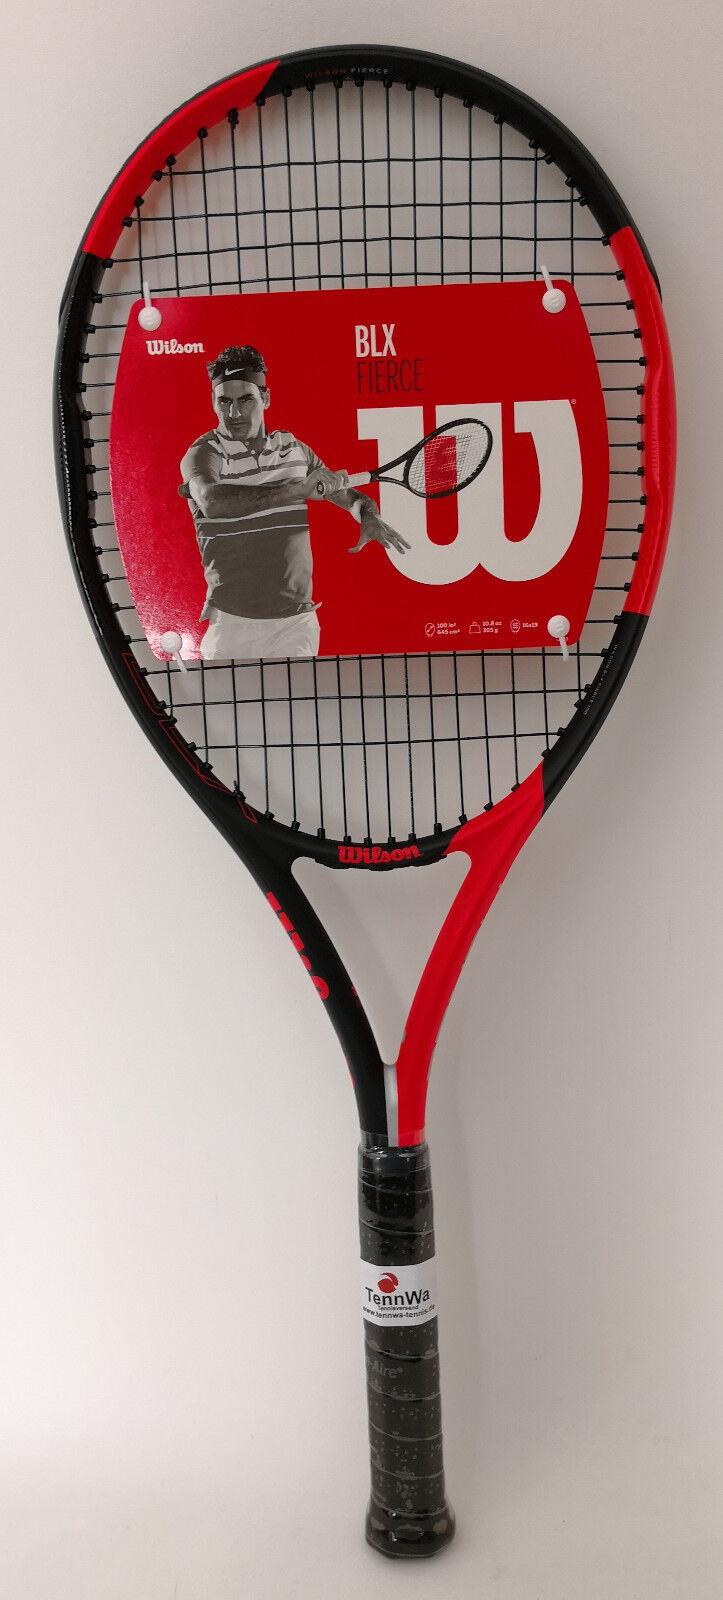 Statt      Allround-Tennisschläger Wilson BLX Fierce, besaitet, SUPER DESIGN 7a8b76